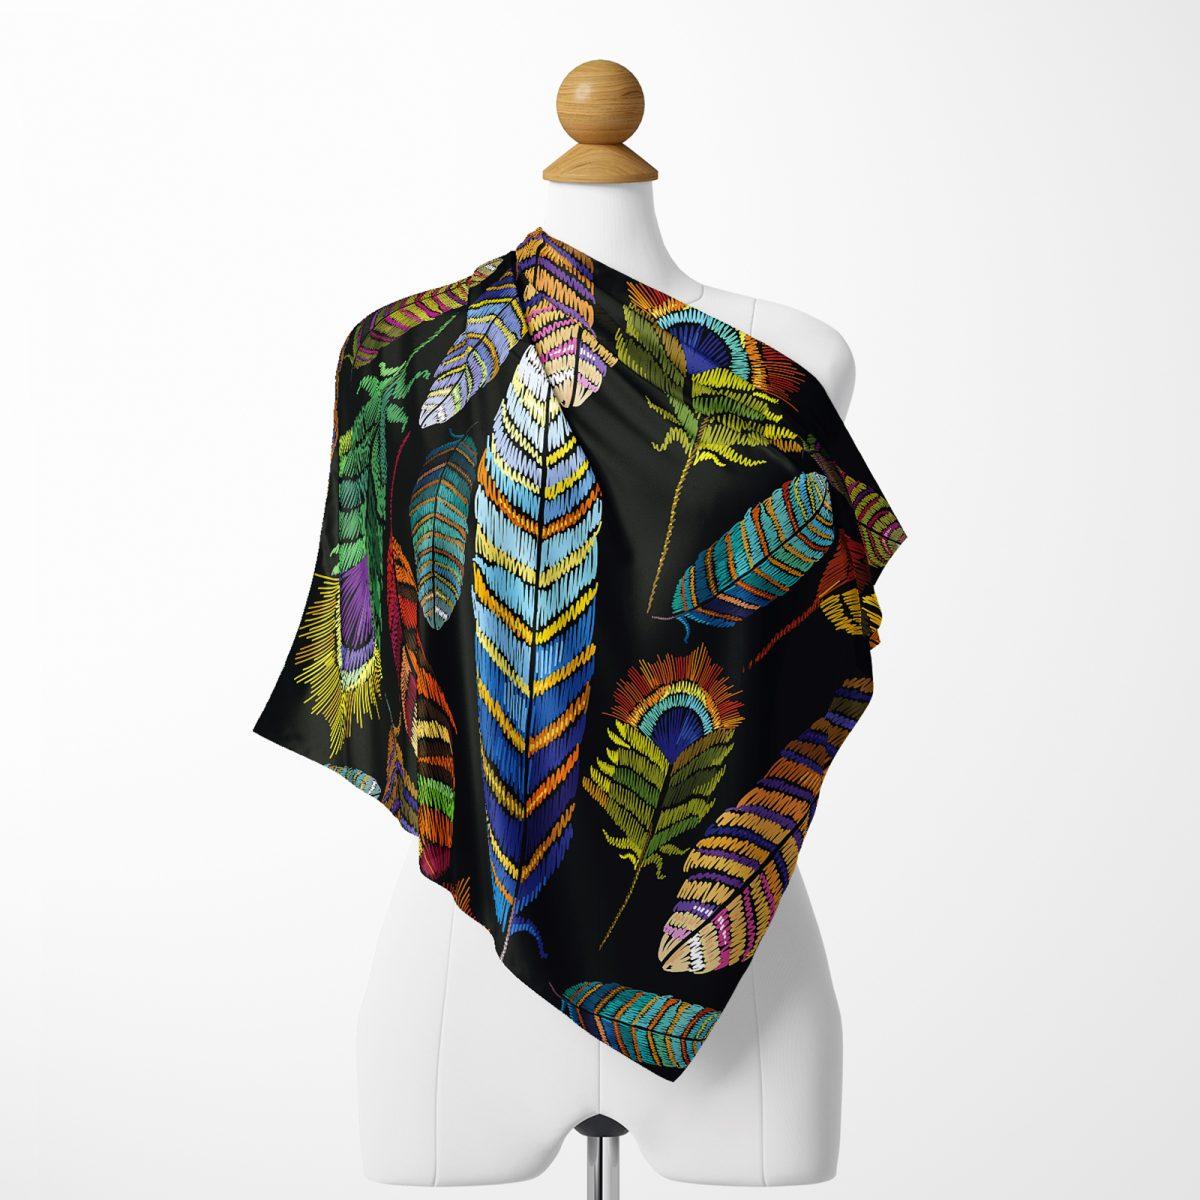 Realhomes Moda Renkli yapraklar Dijital Baskılı Modern Tivil Eşarp Realhomes